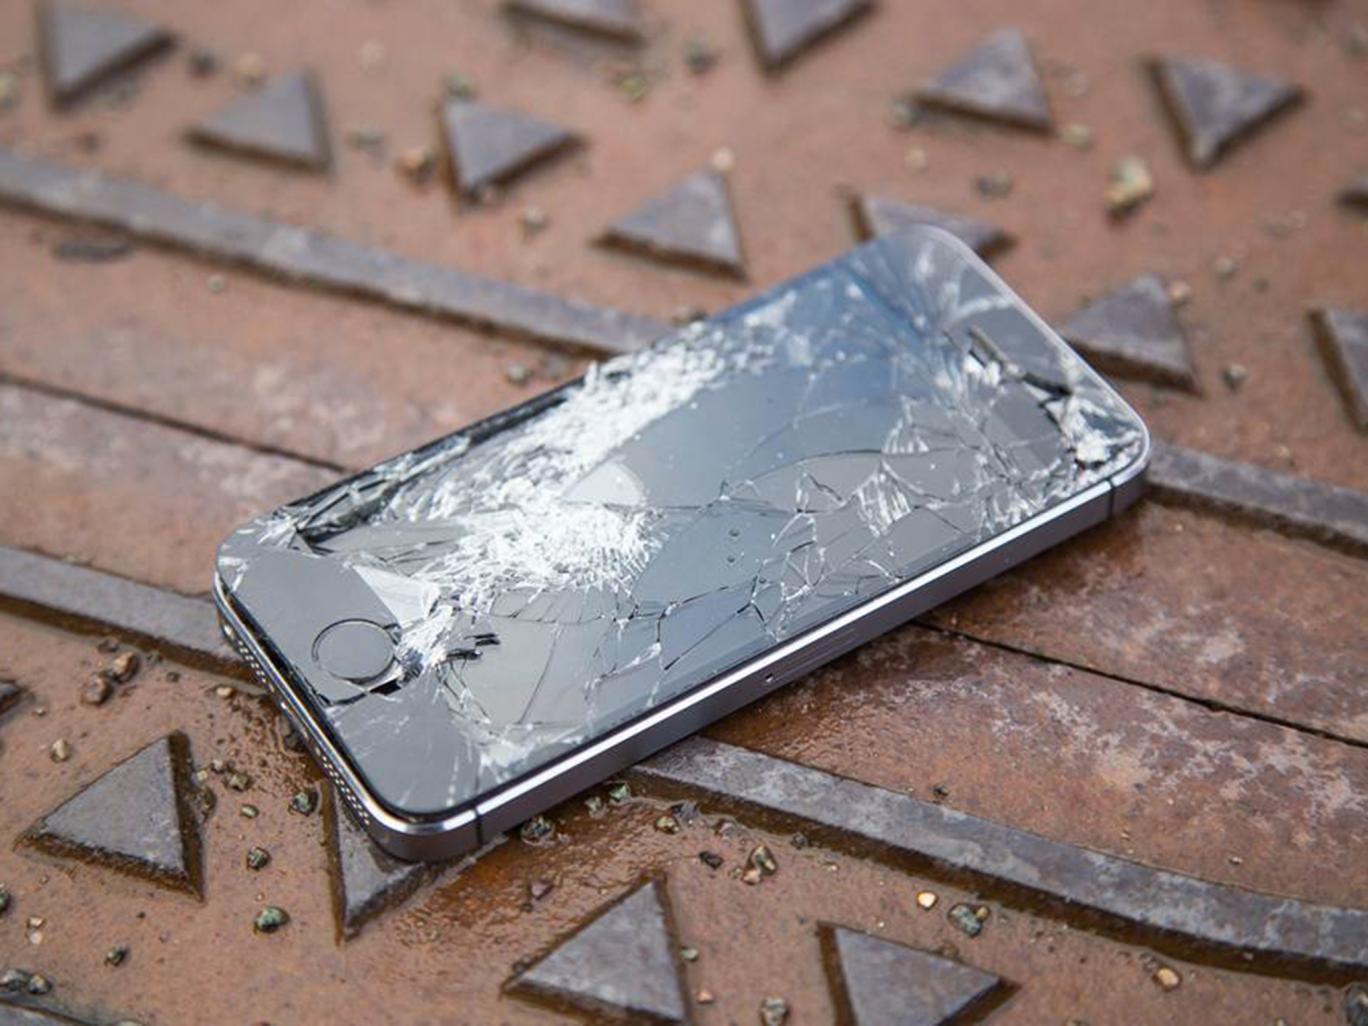 Smashed-broken-iphone